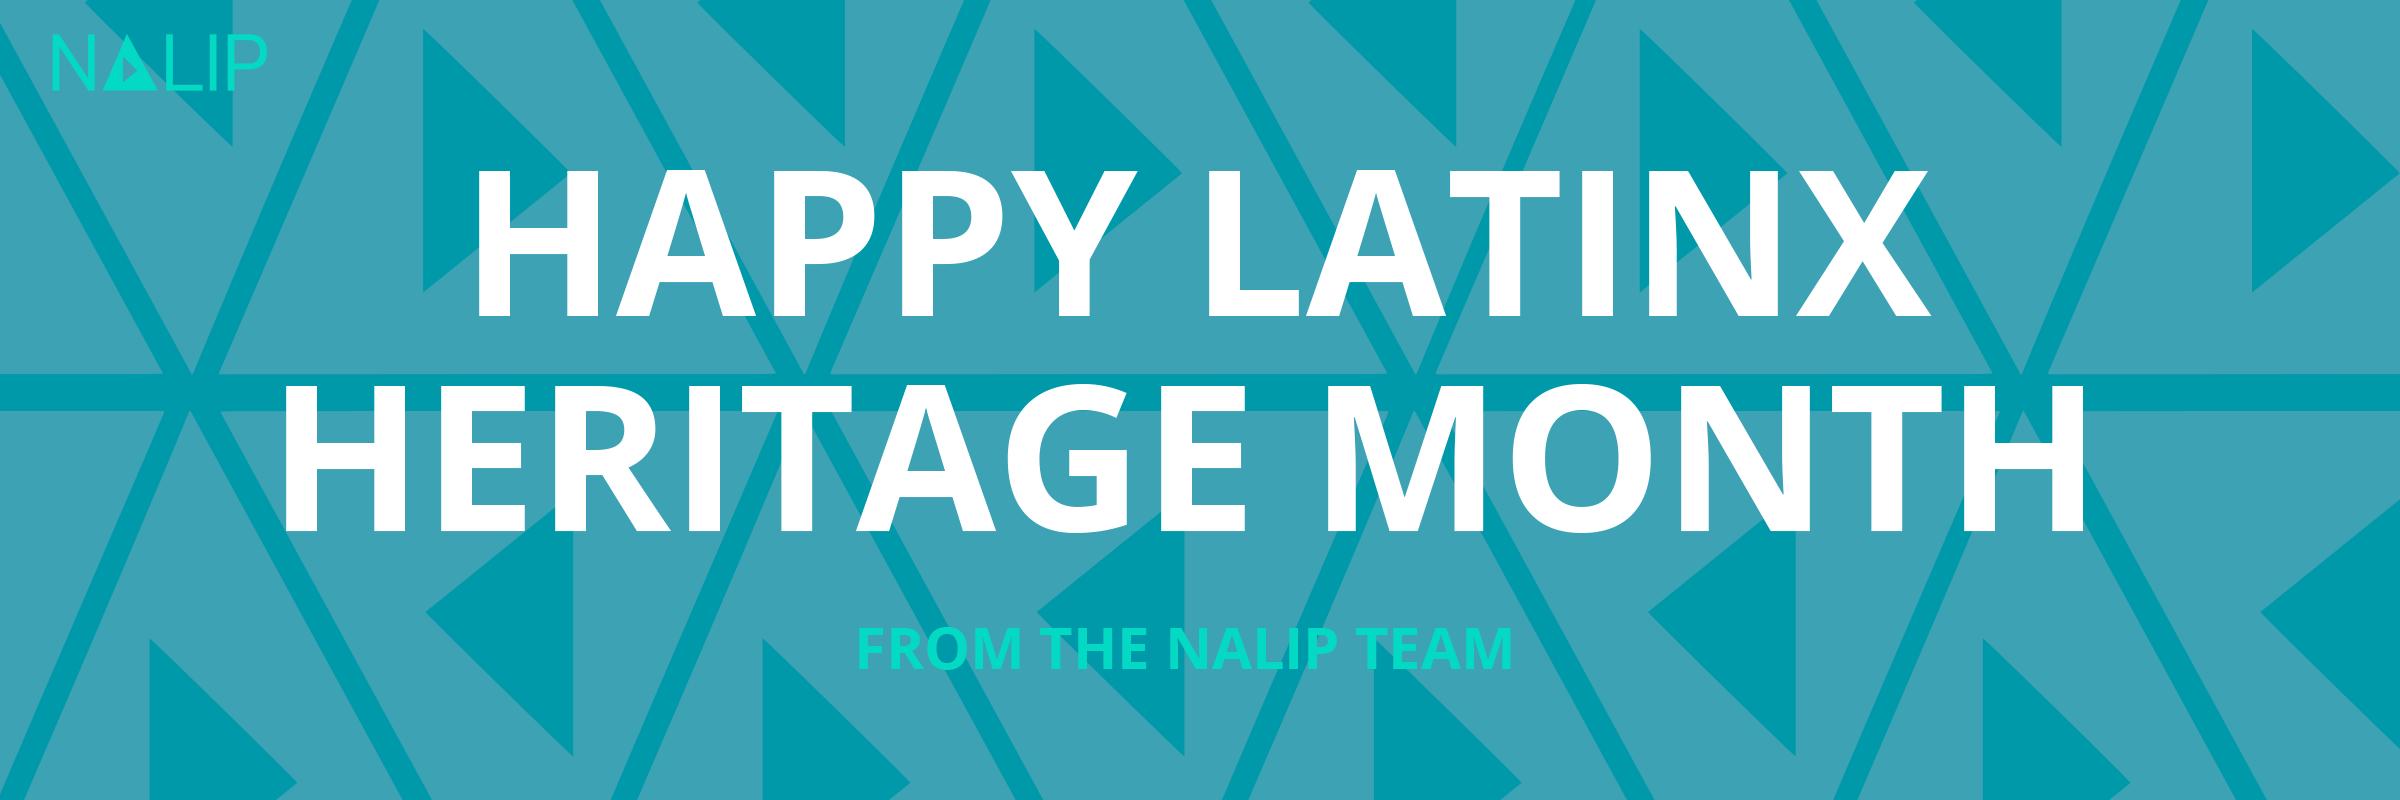 NALIP's Picks for Latinx Heritage Month 2021<